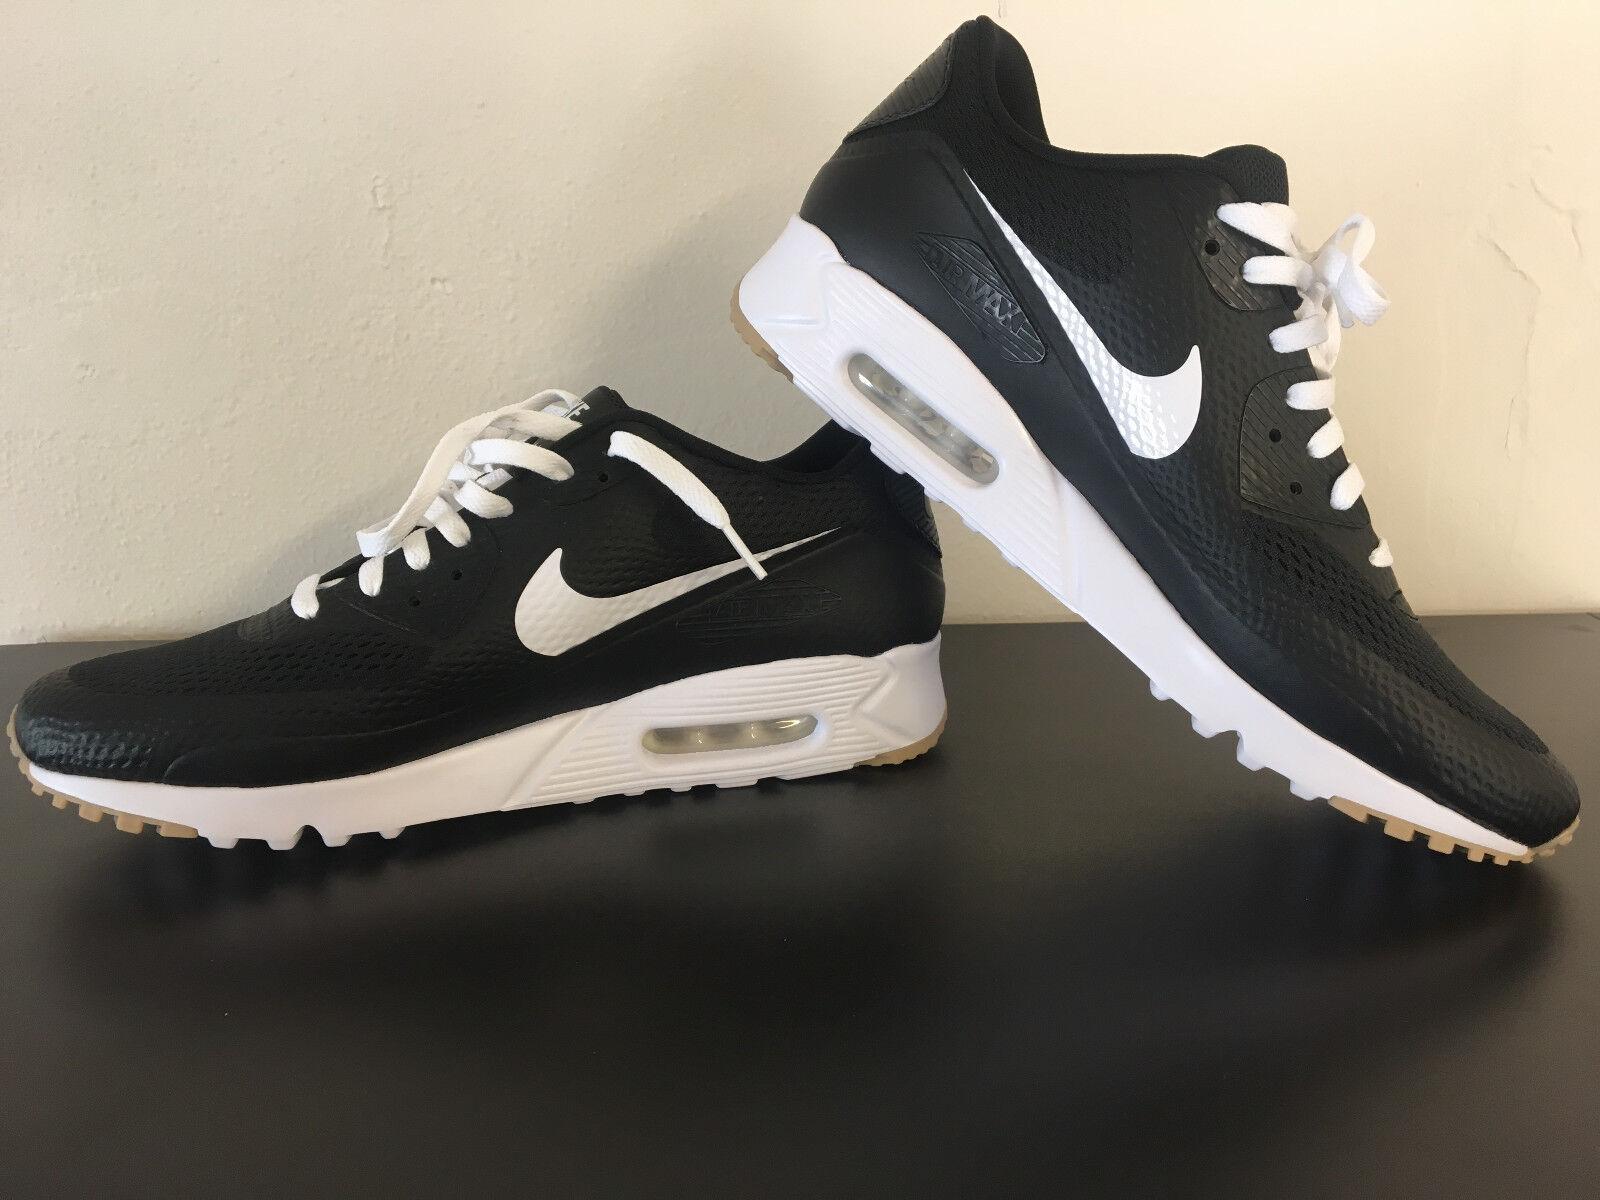 Nike Air Max 90 Ultra Essential Mens Black White 819474 010 Mens Essential Size 13 d986fc